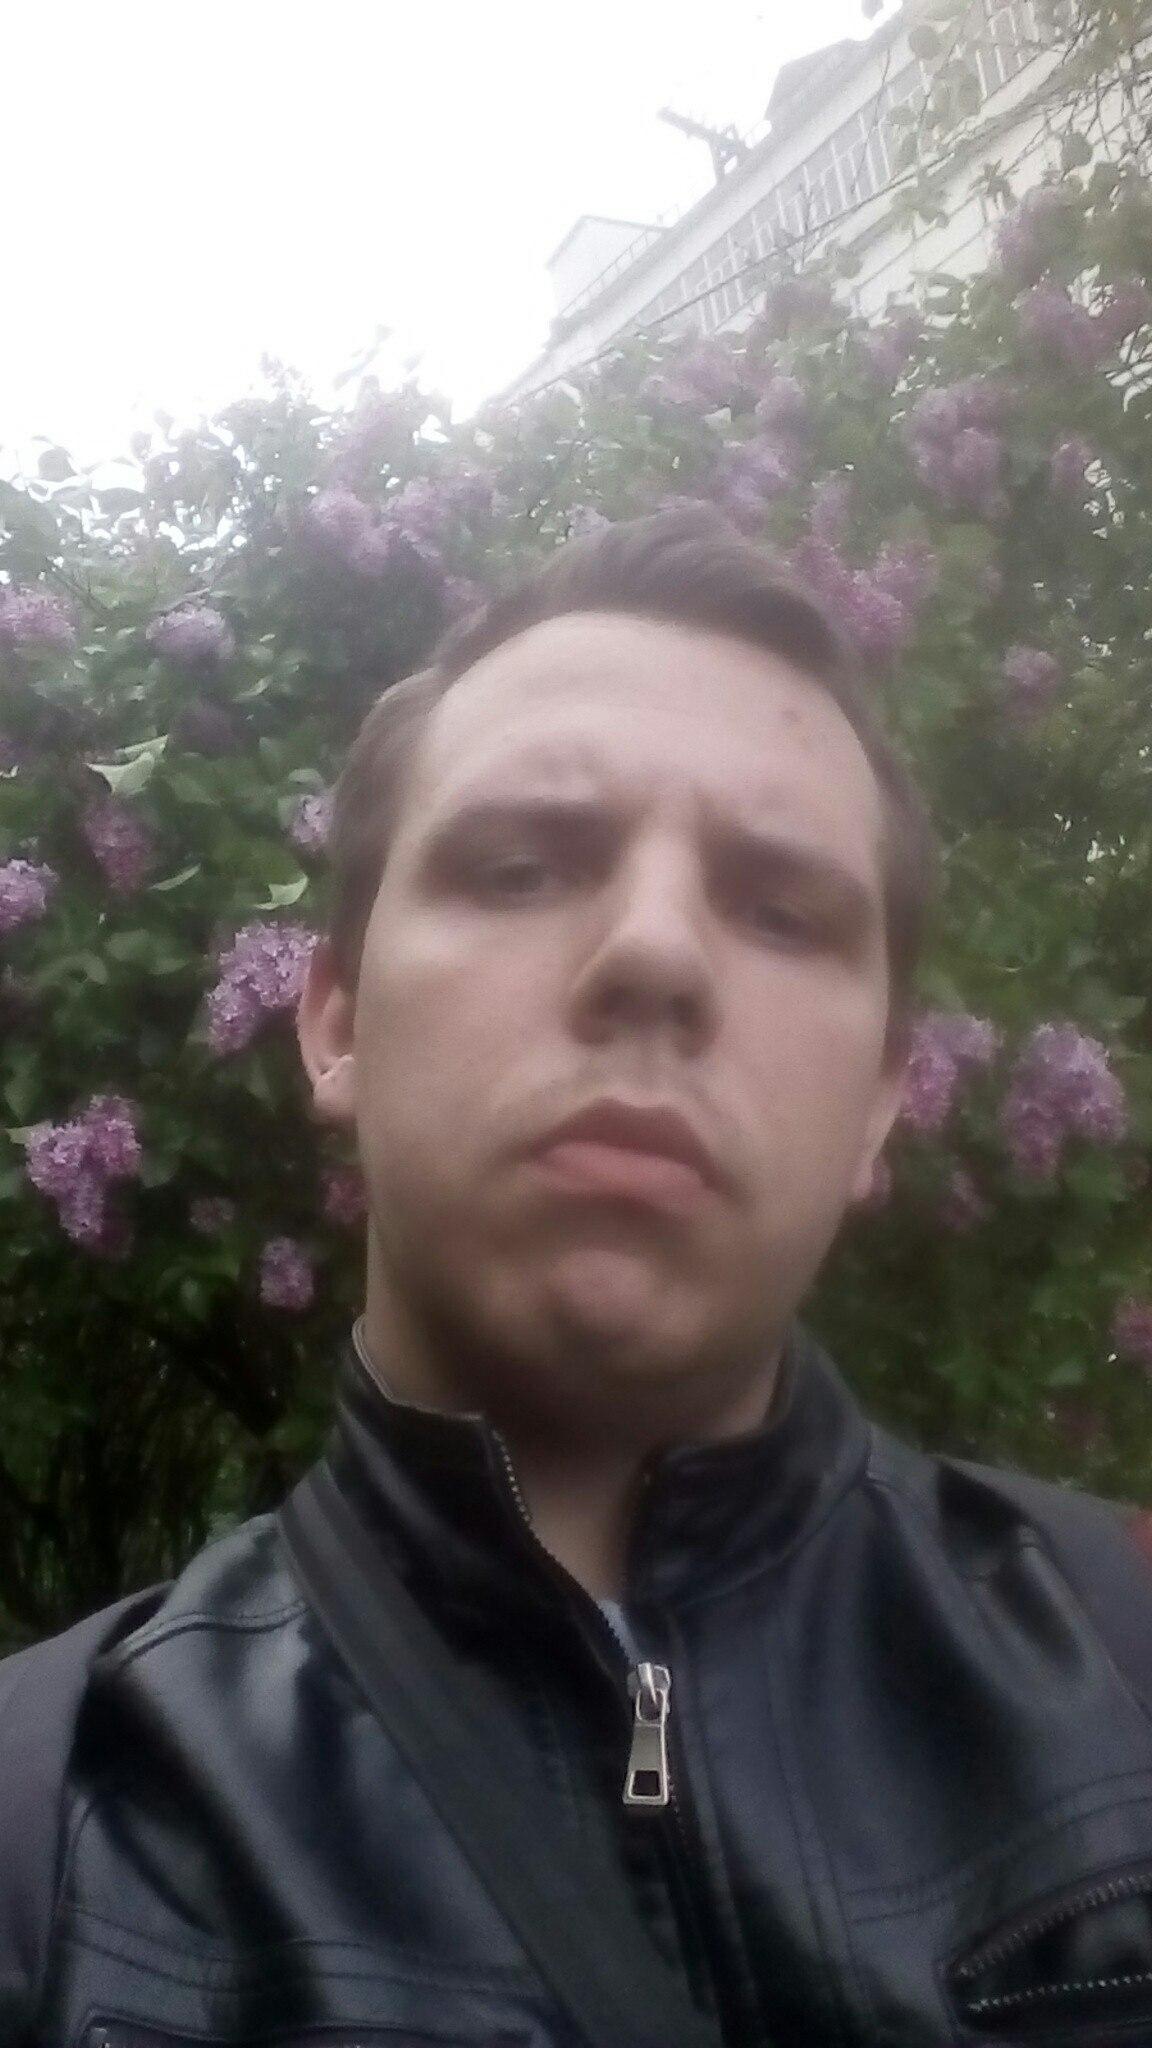 Krupitsyin, 24, Gatchina